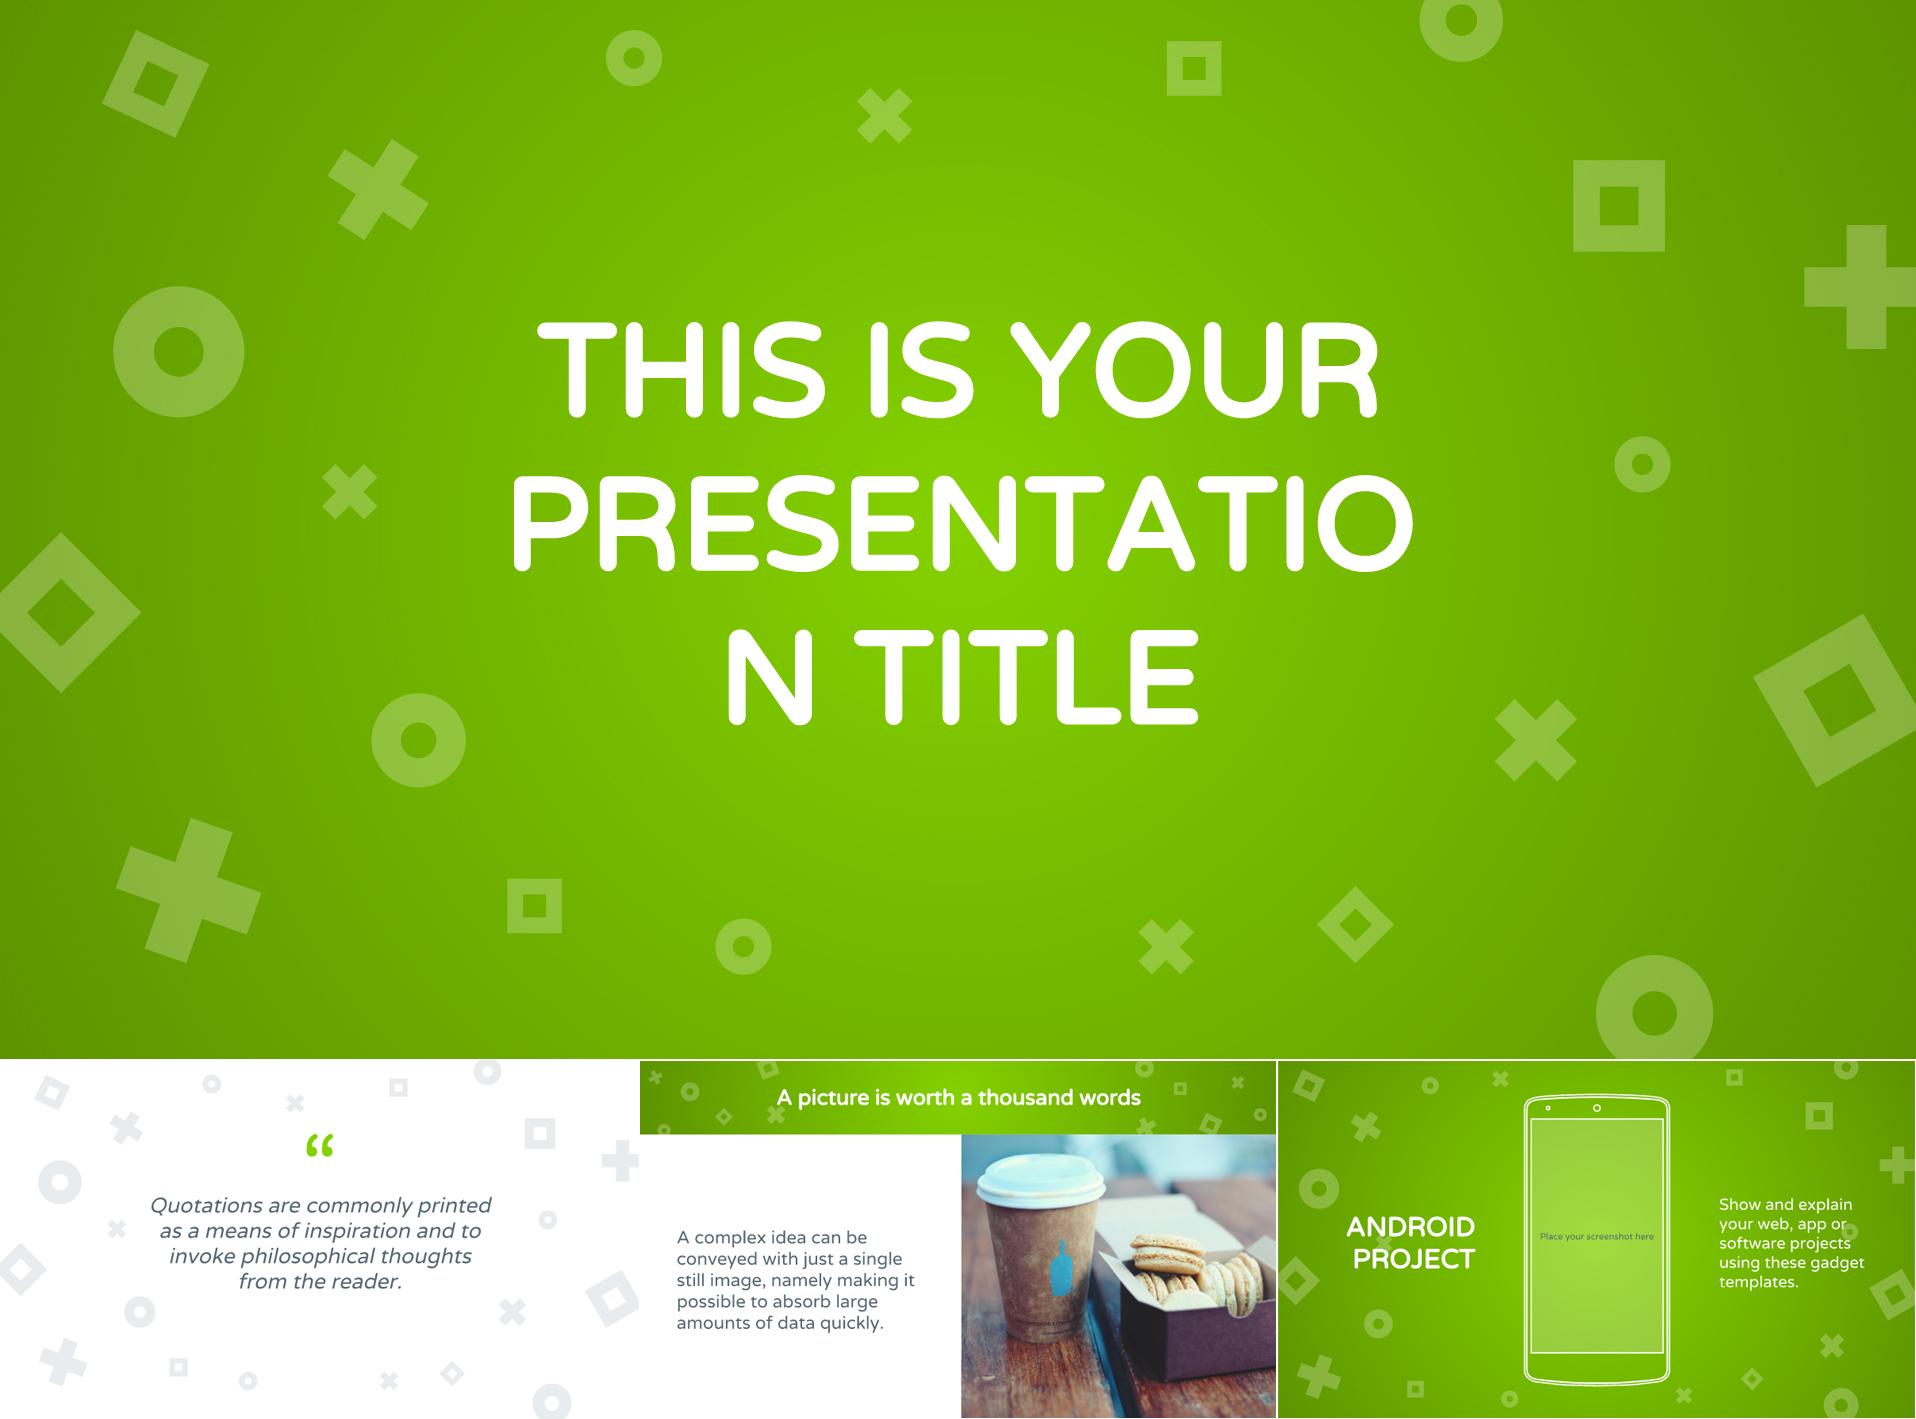 Lively Green Google Slides Presentation Template - The Internet Tips